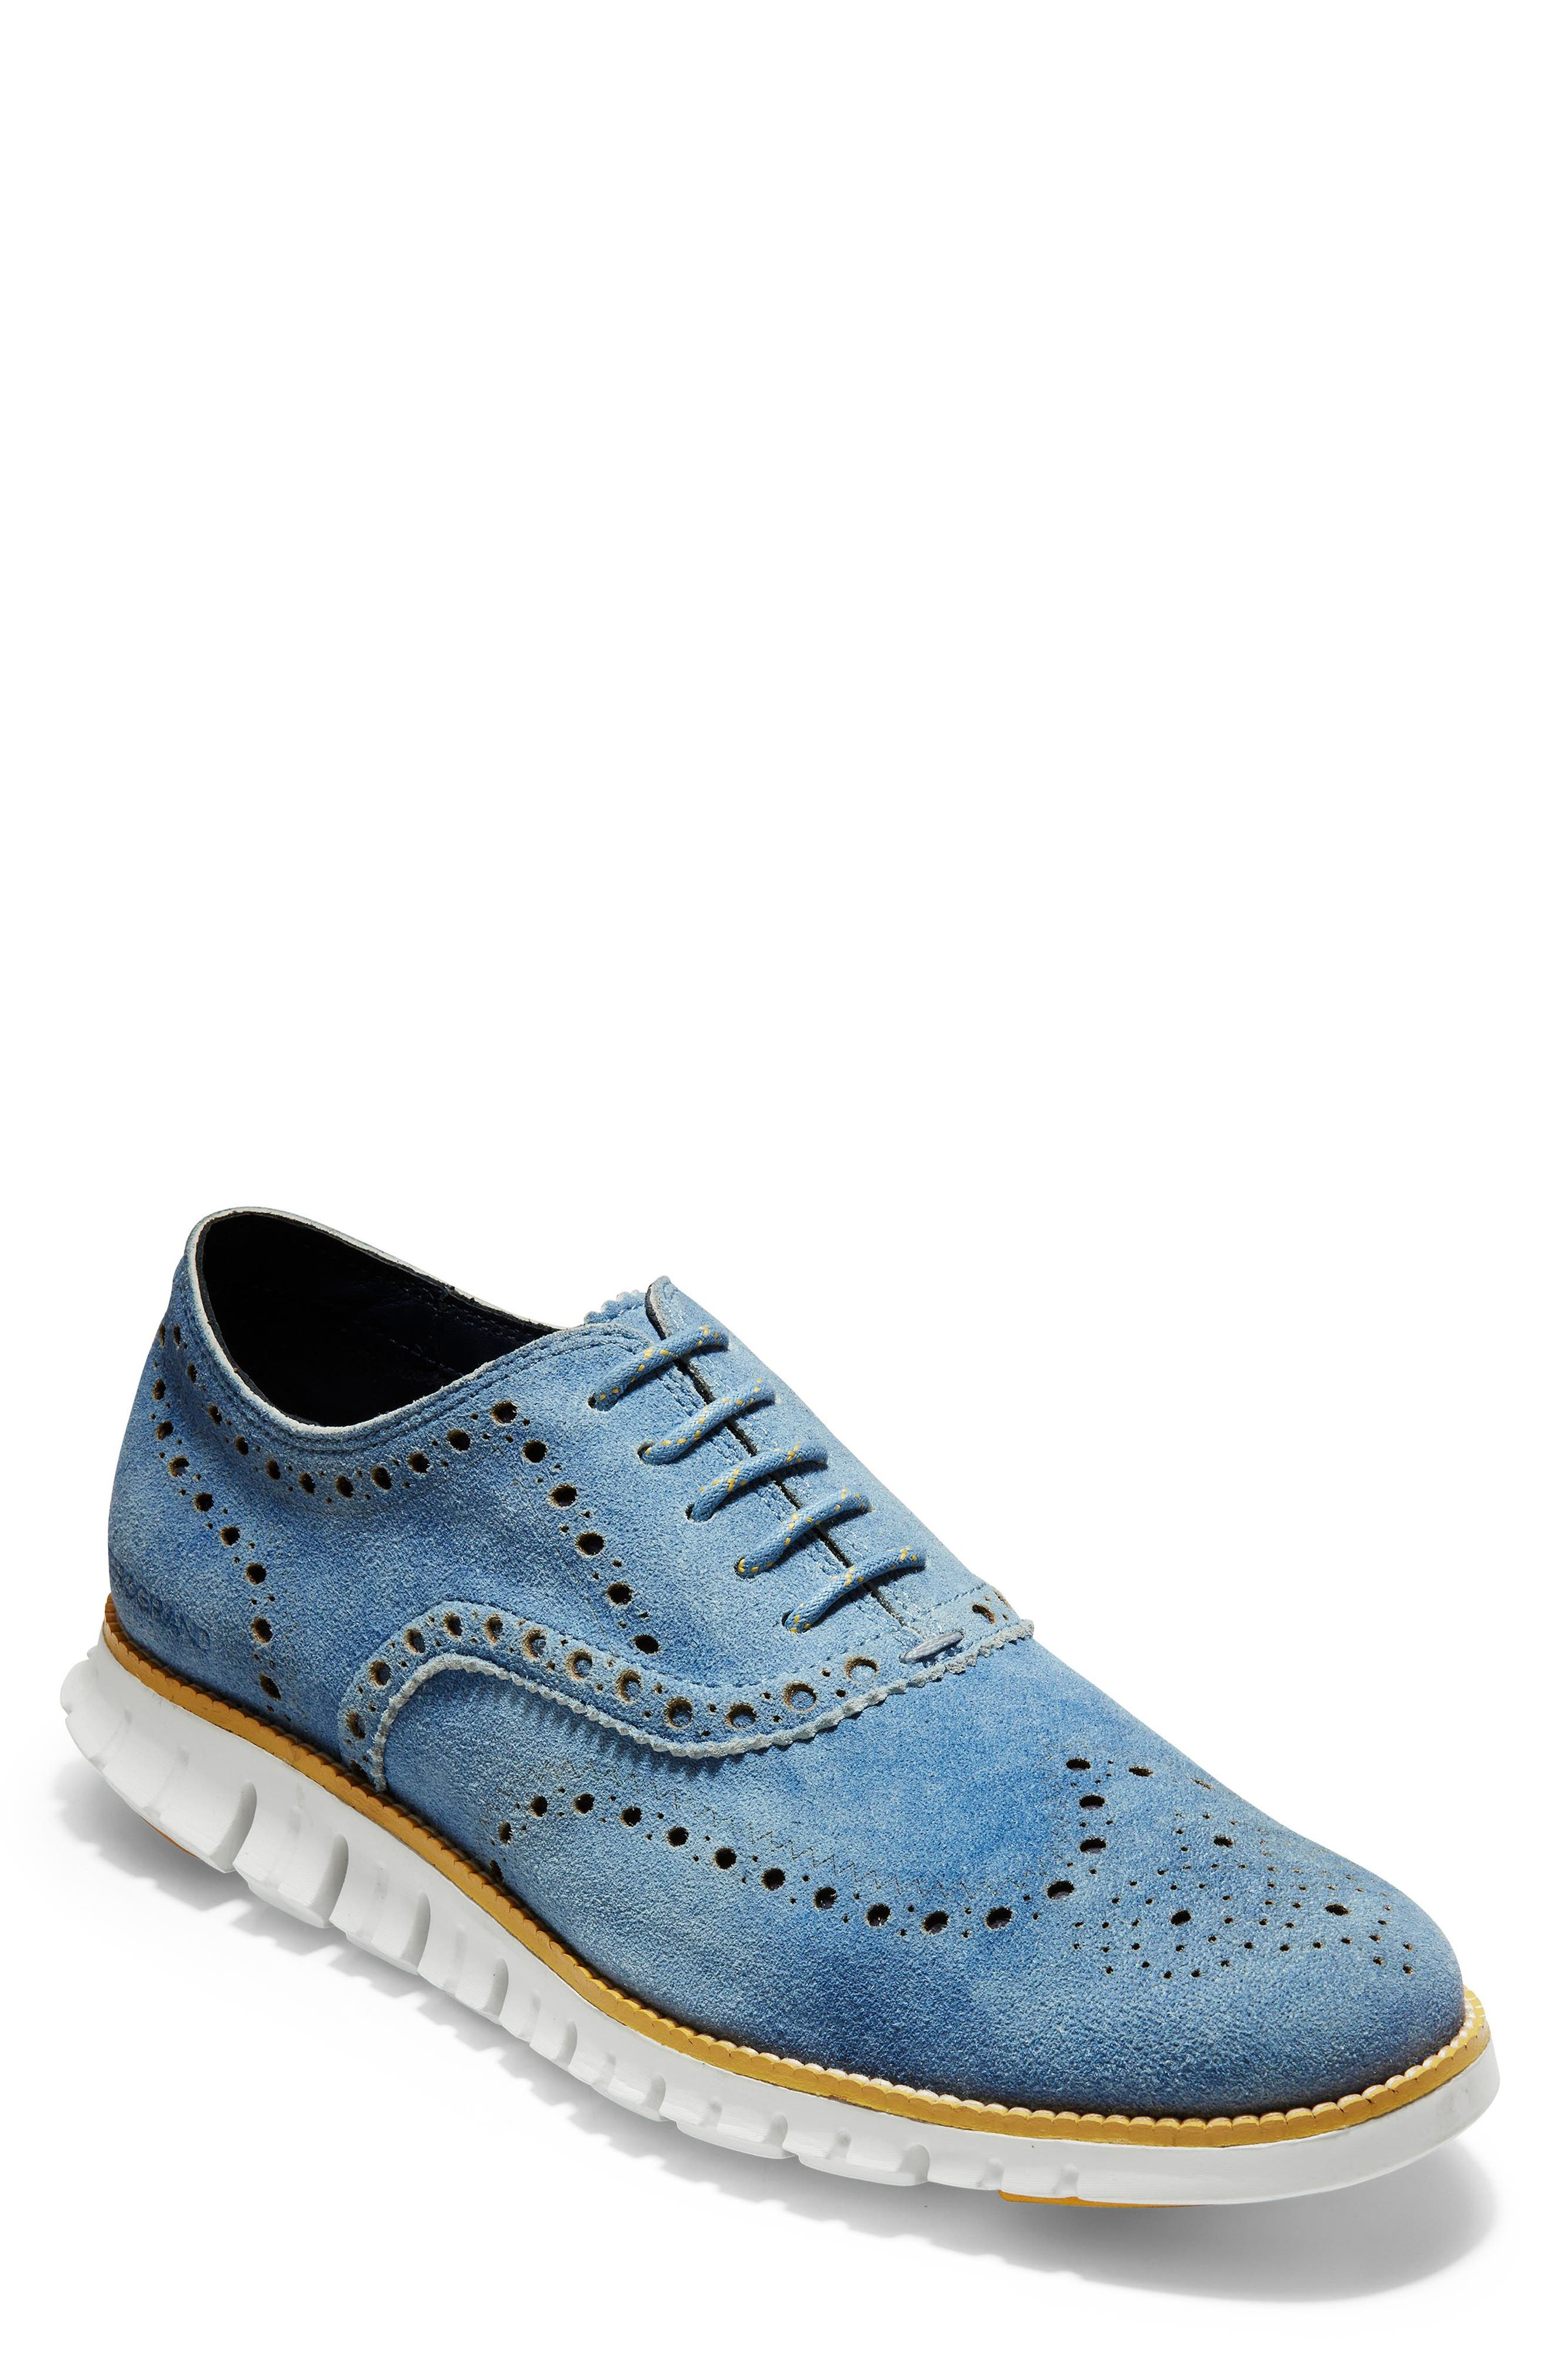 COLE HAAN 'ZeroGrand' Wingtip Oxford, Main, color, DENIM BLUE SUEDE